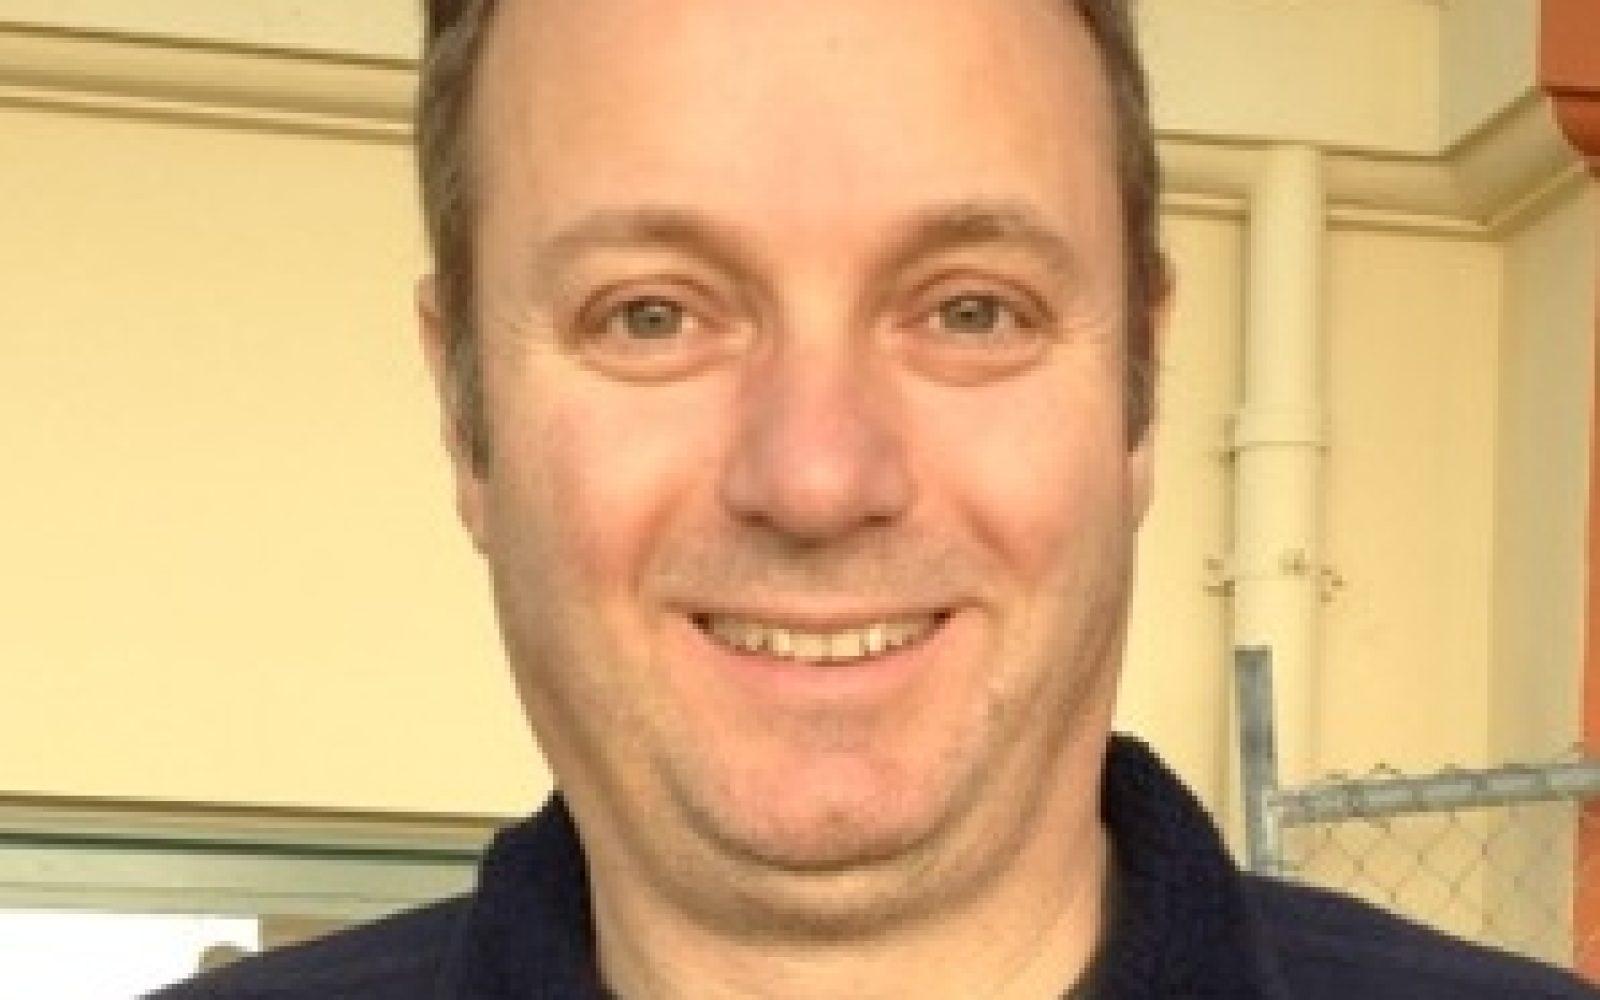 Vice President of iPhone and iPod Engineering David Tupman left